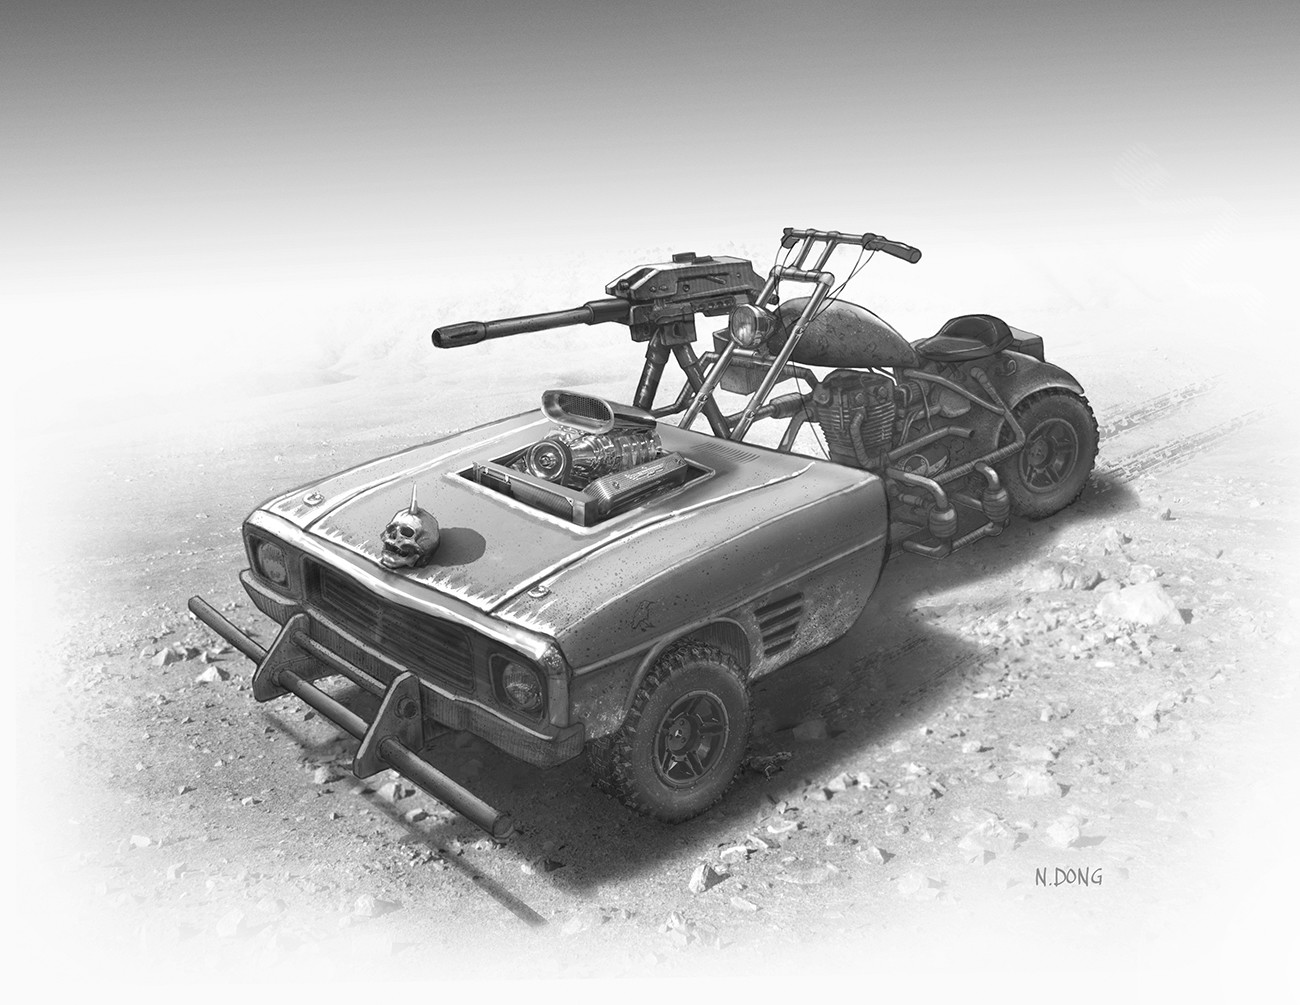 Madmax Style Vehicle Design